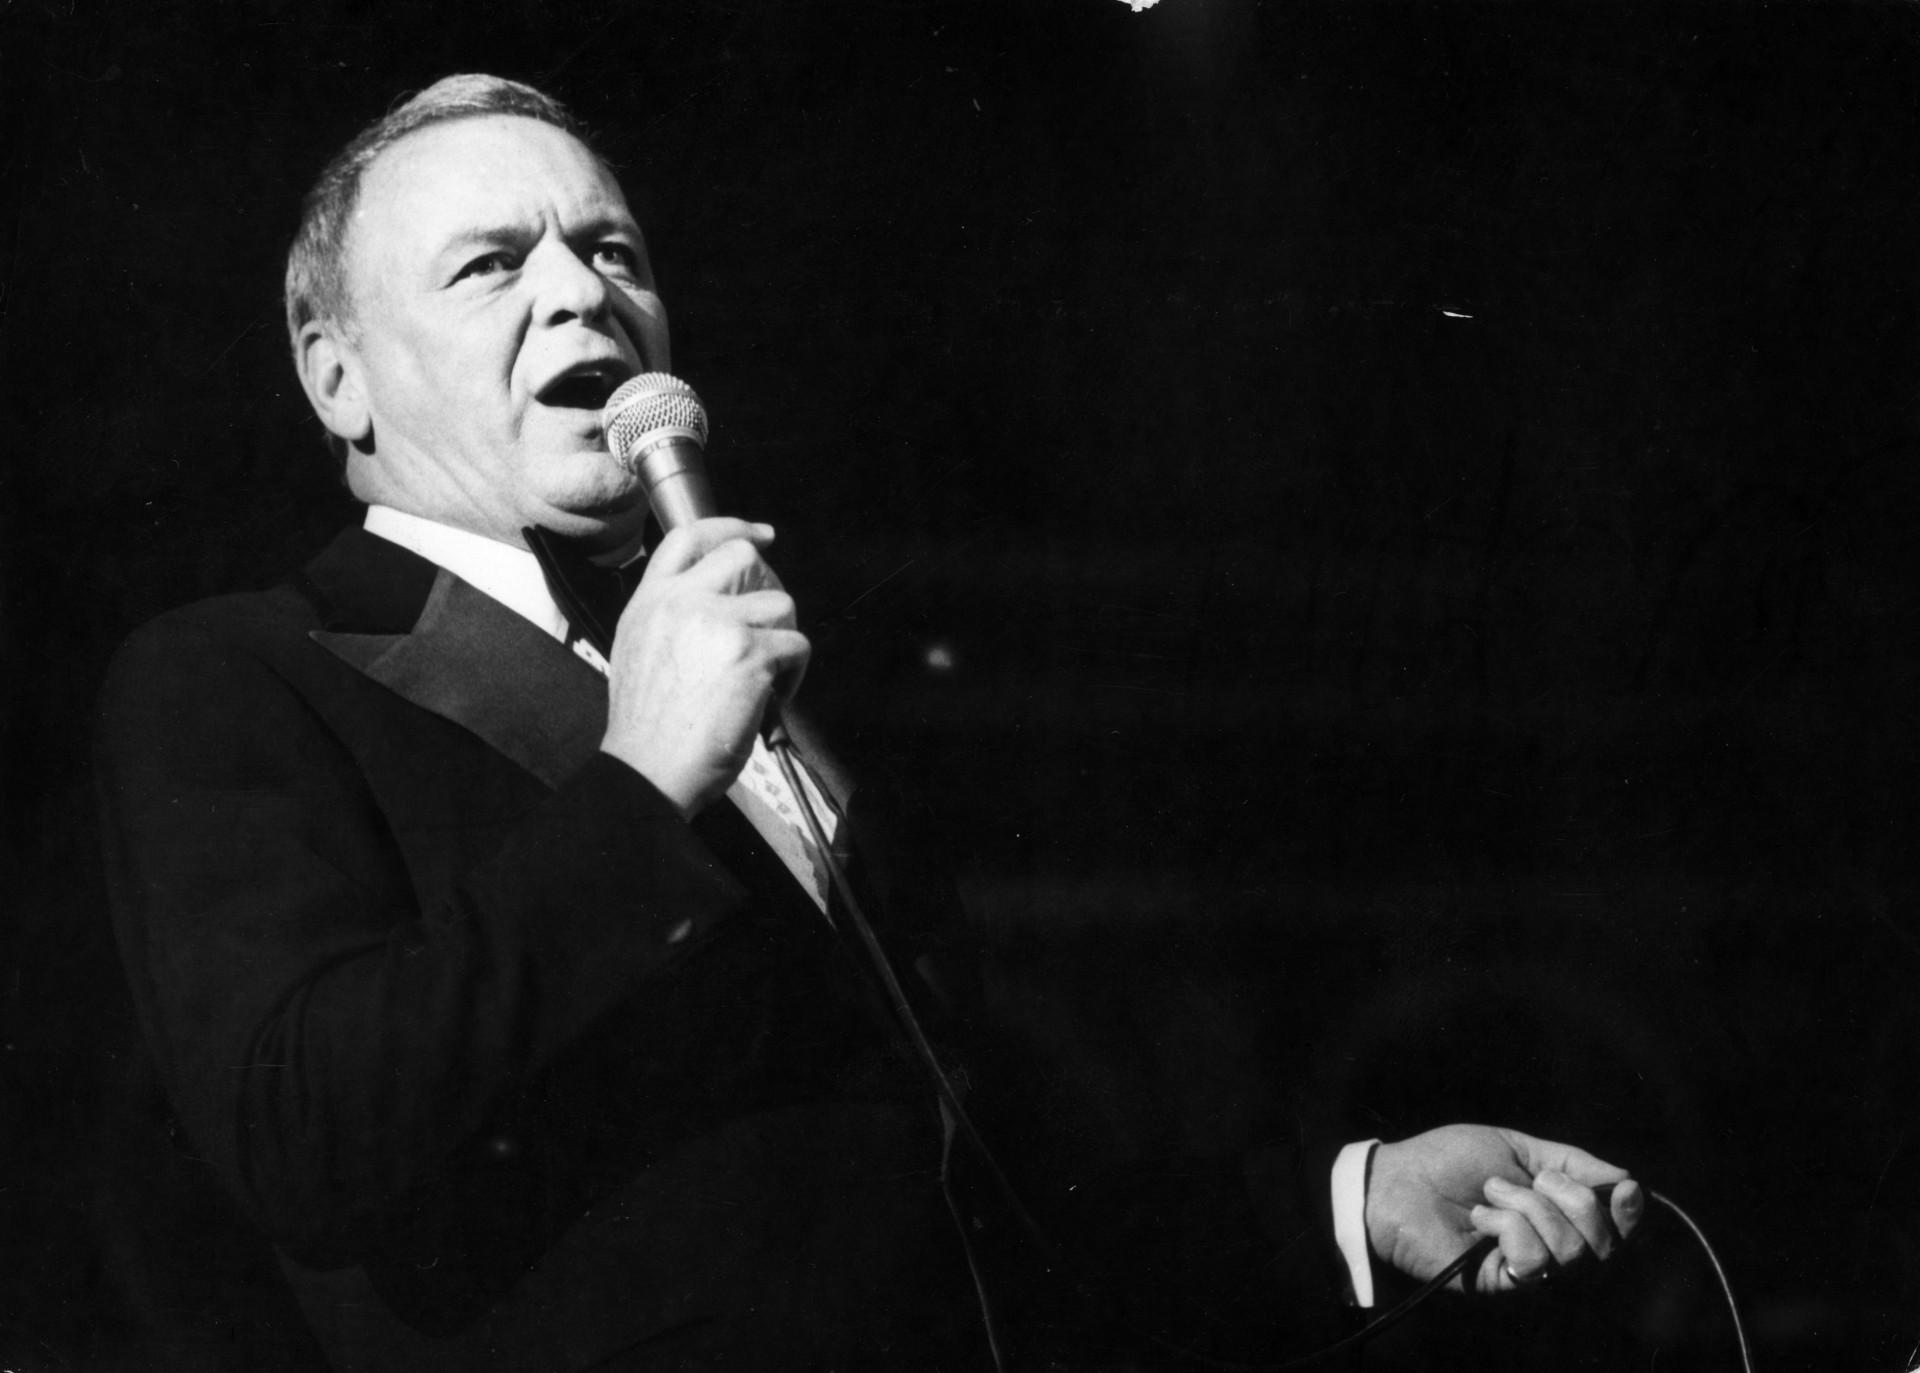 De McCartney a Sinatra: os astros que já cantaram sobre o Brasil